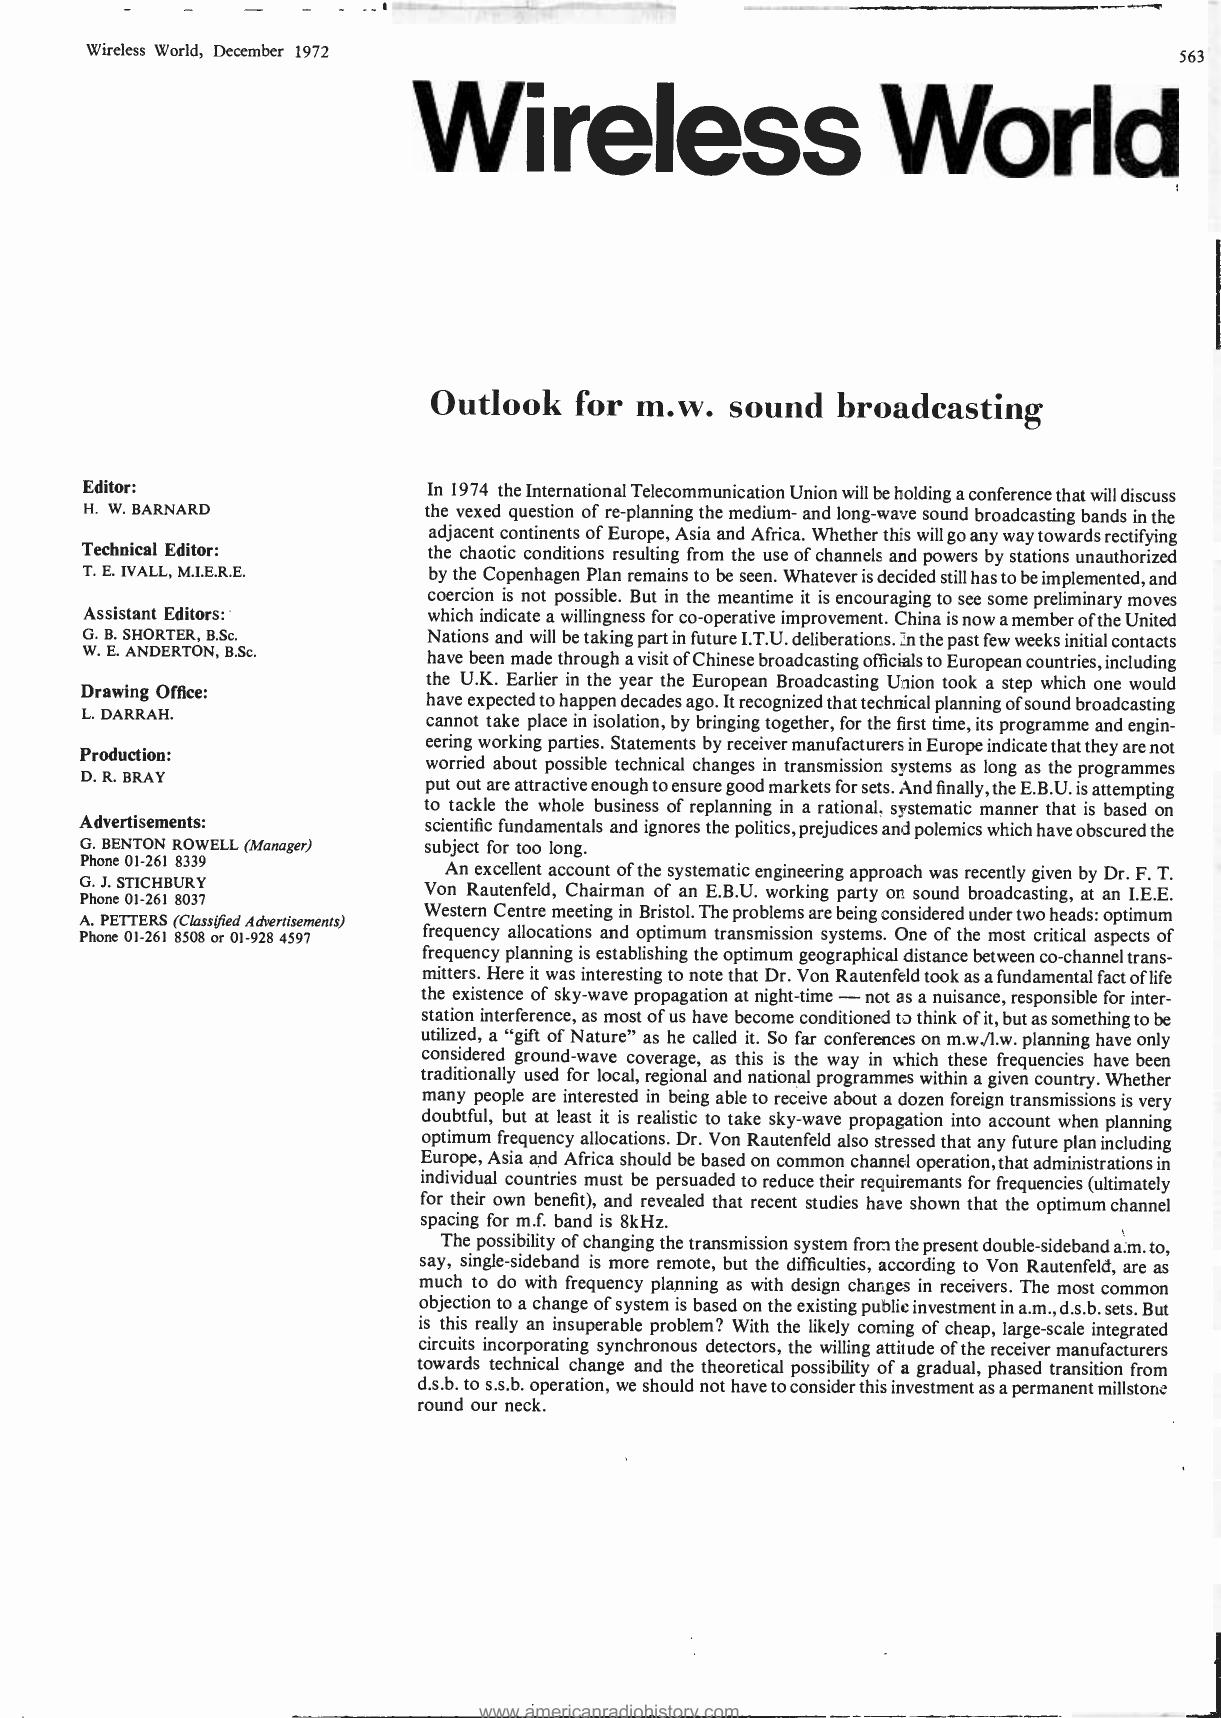 Wireless World - American Radio History | manualzz com